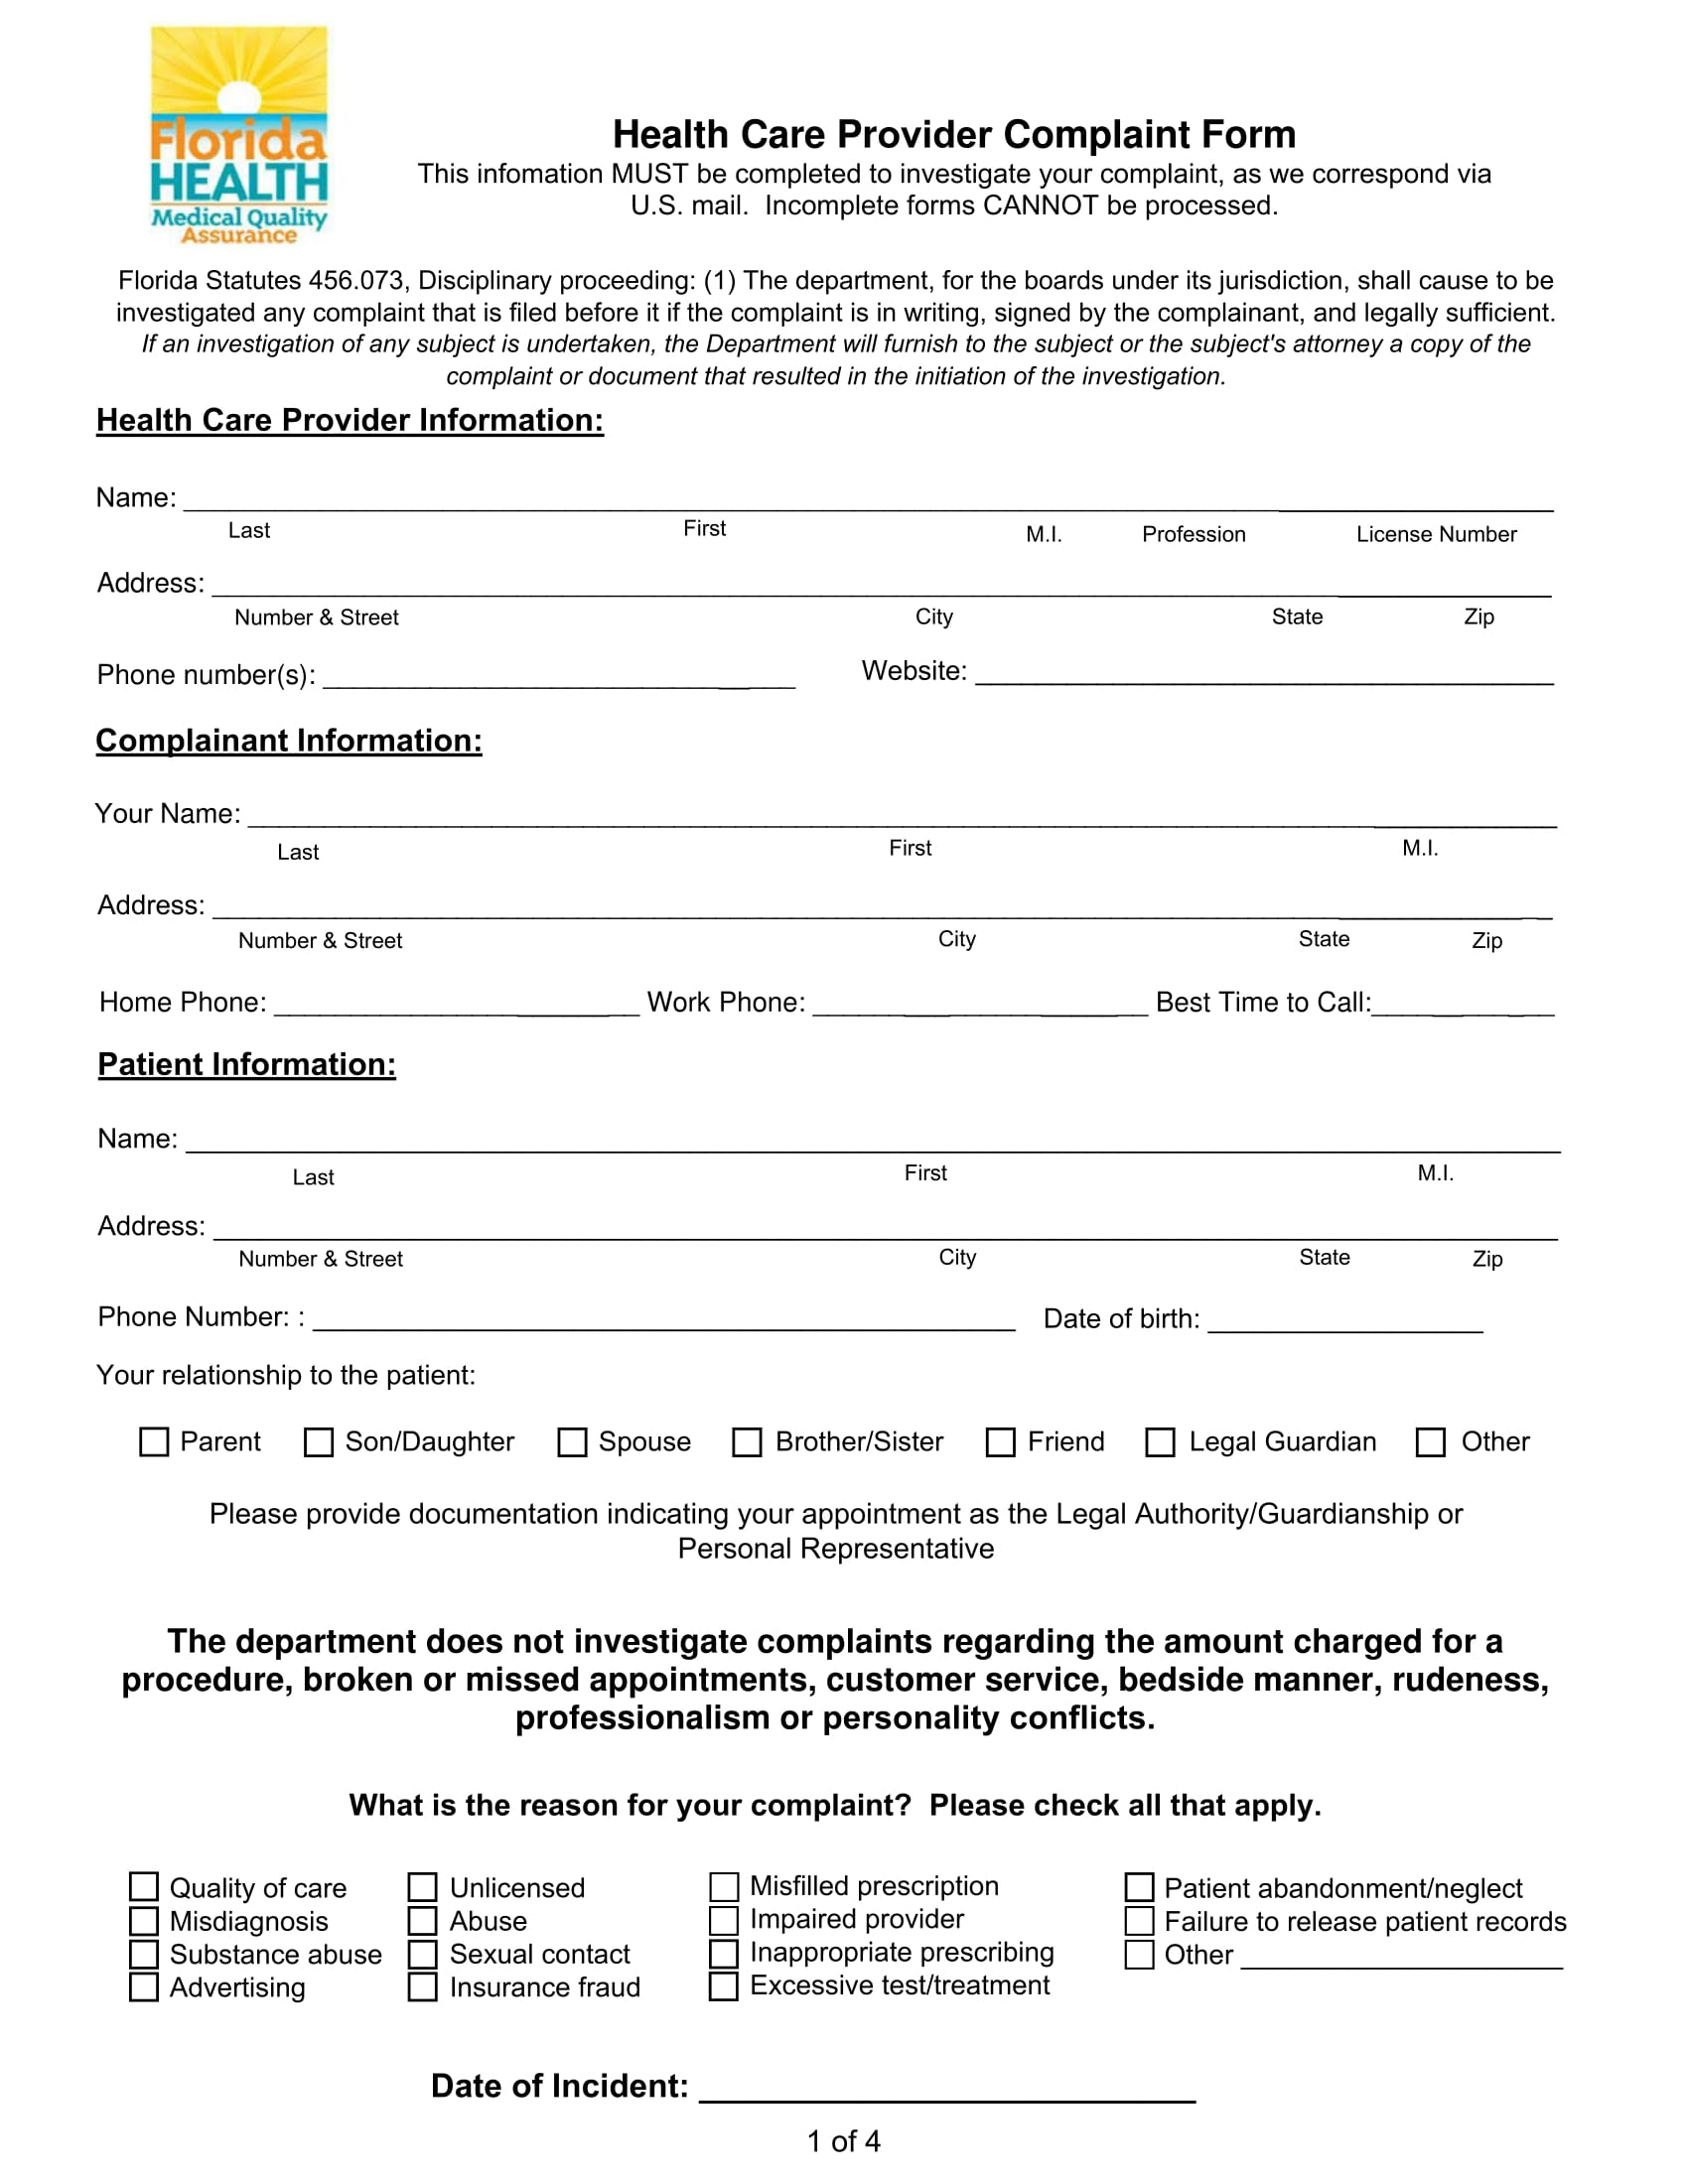 health care provider complaint form 1